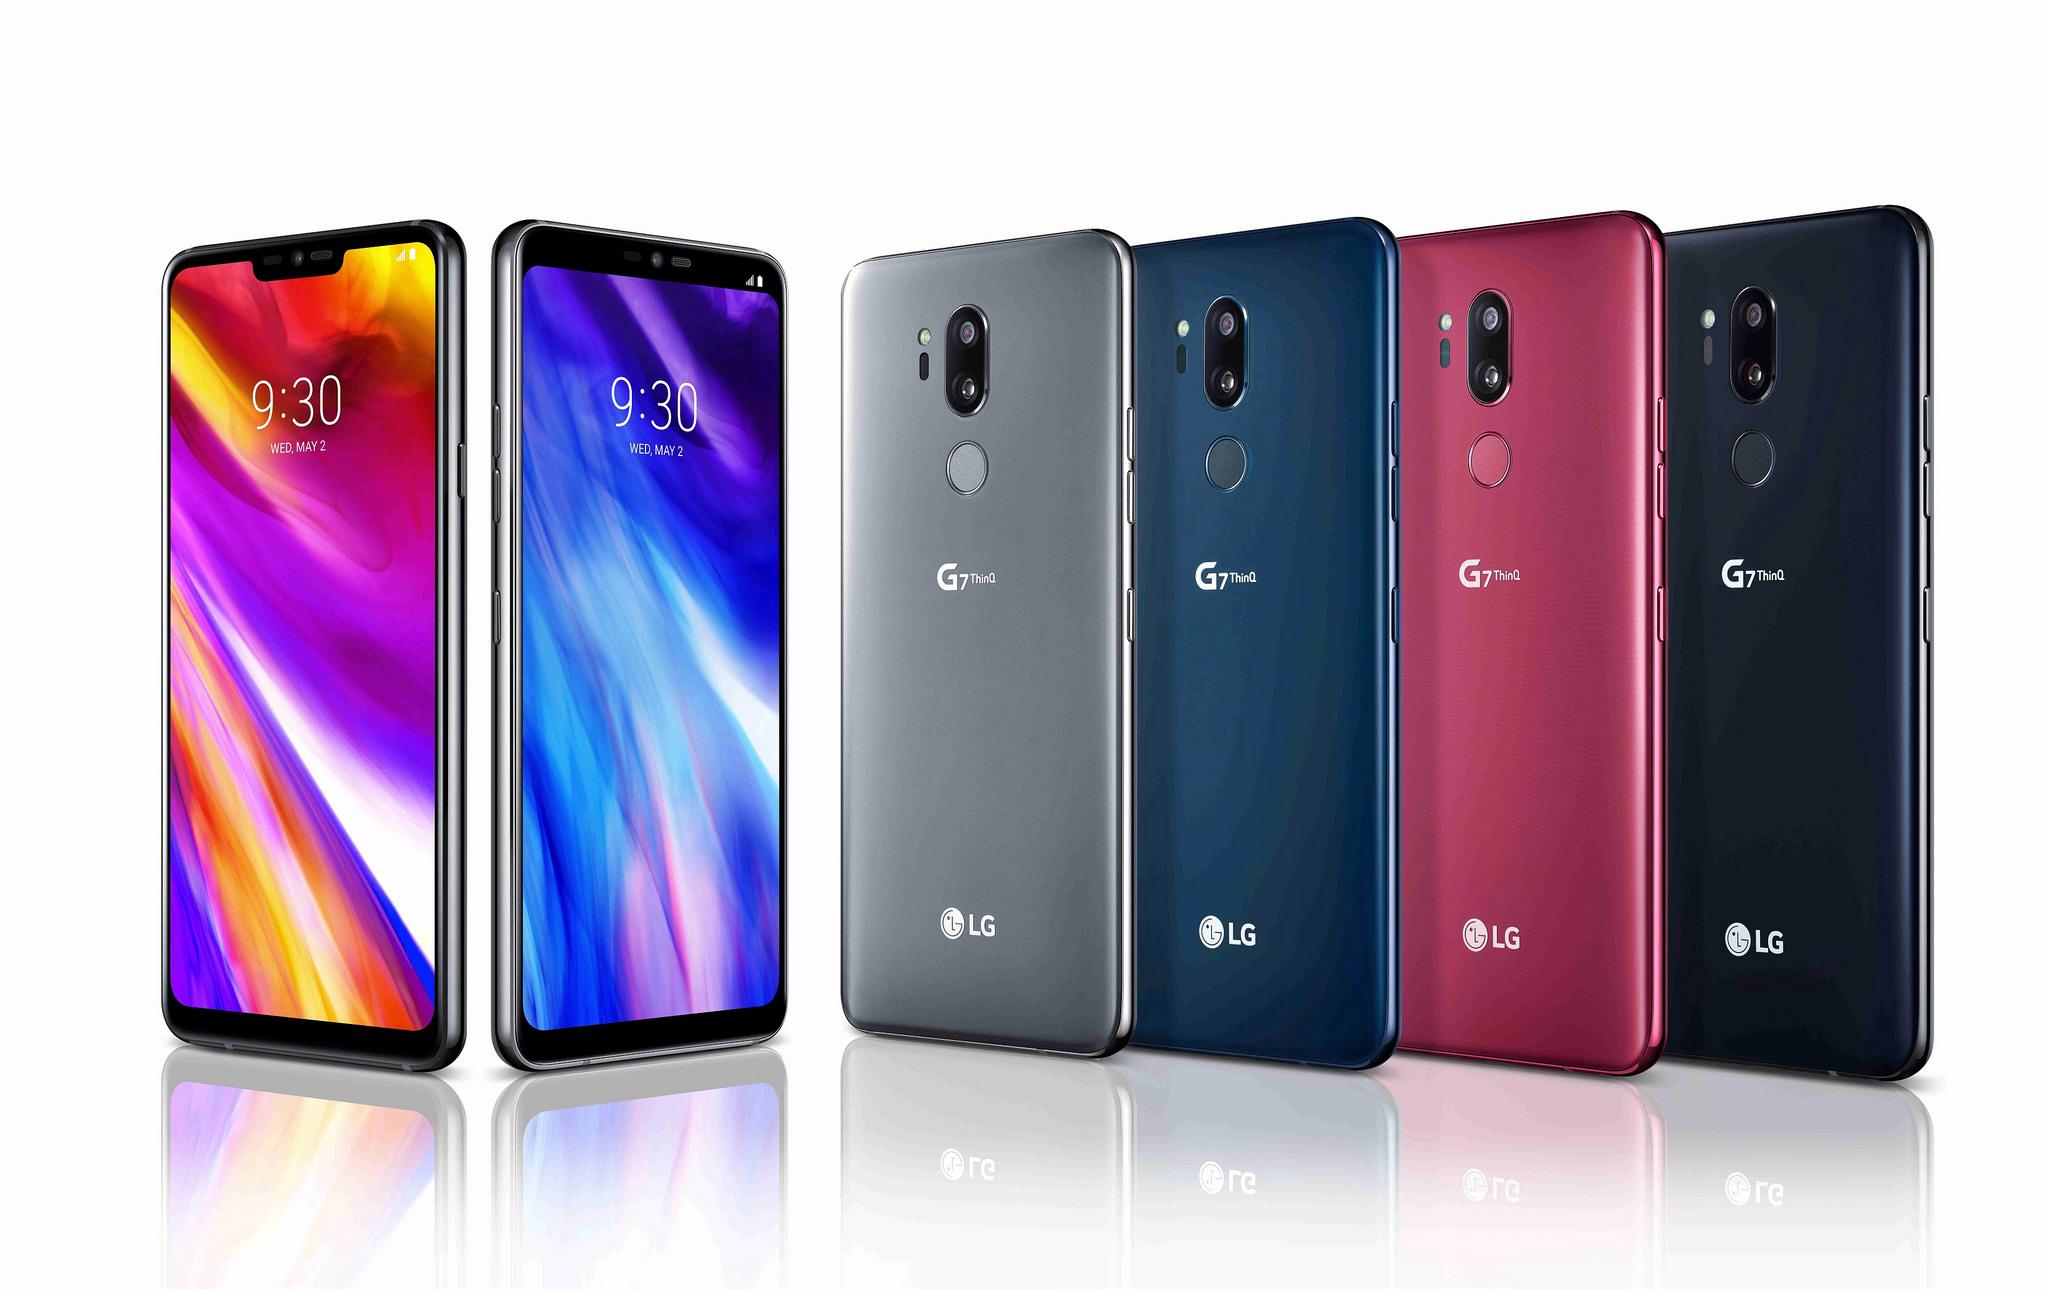 LG G7 ThinQ 공개, 디자인 및 주요 특징은? - LG전...